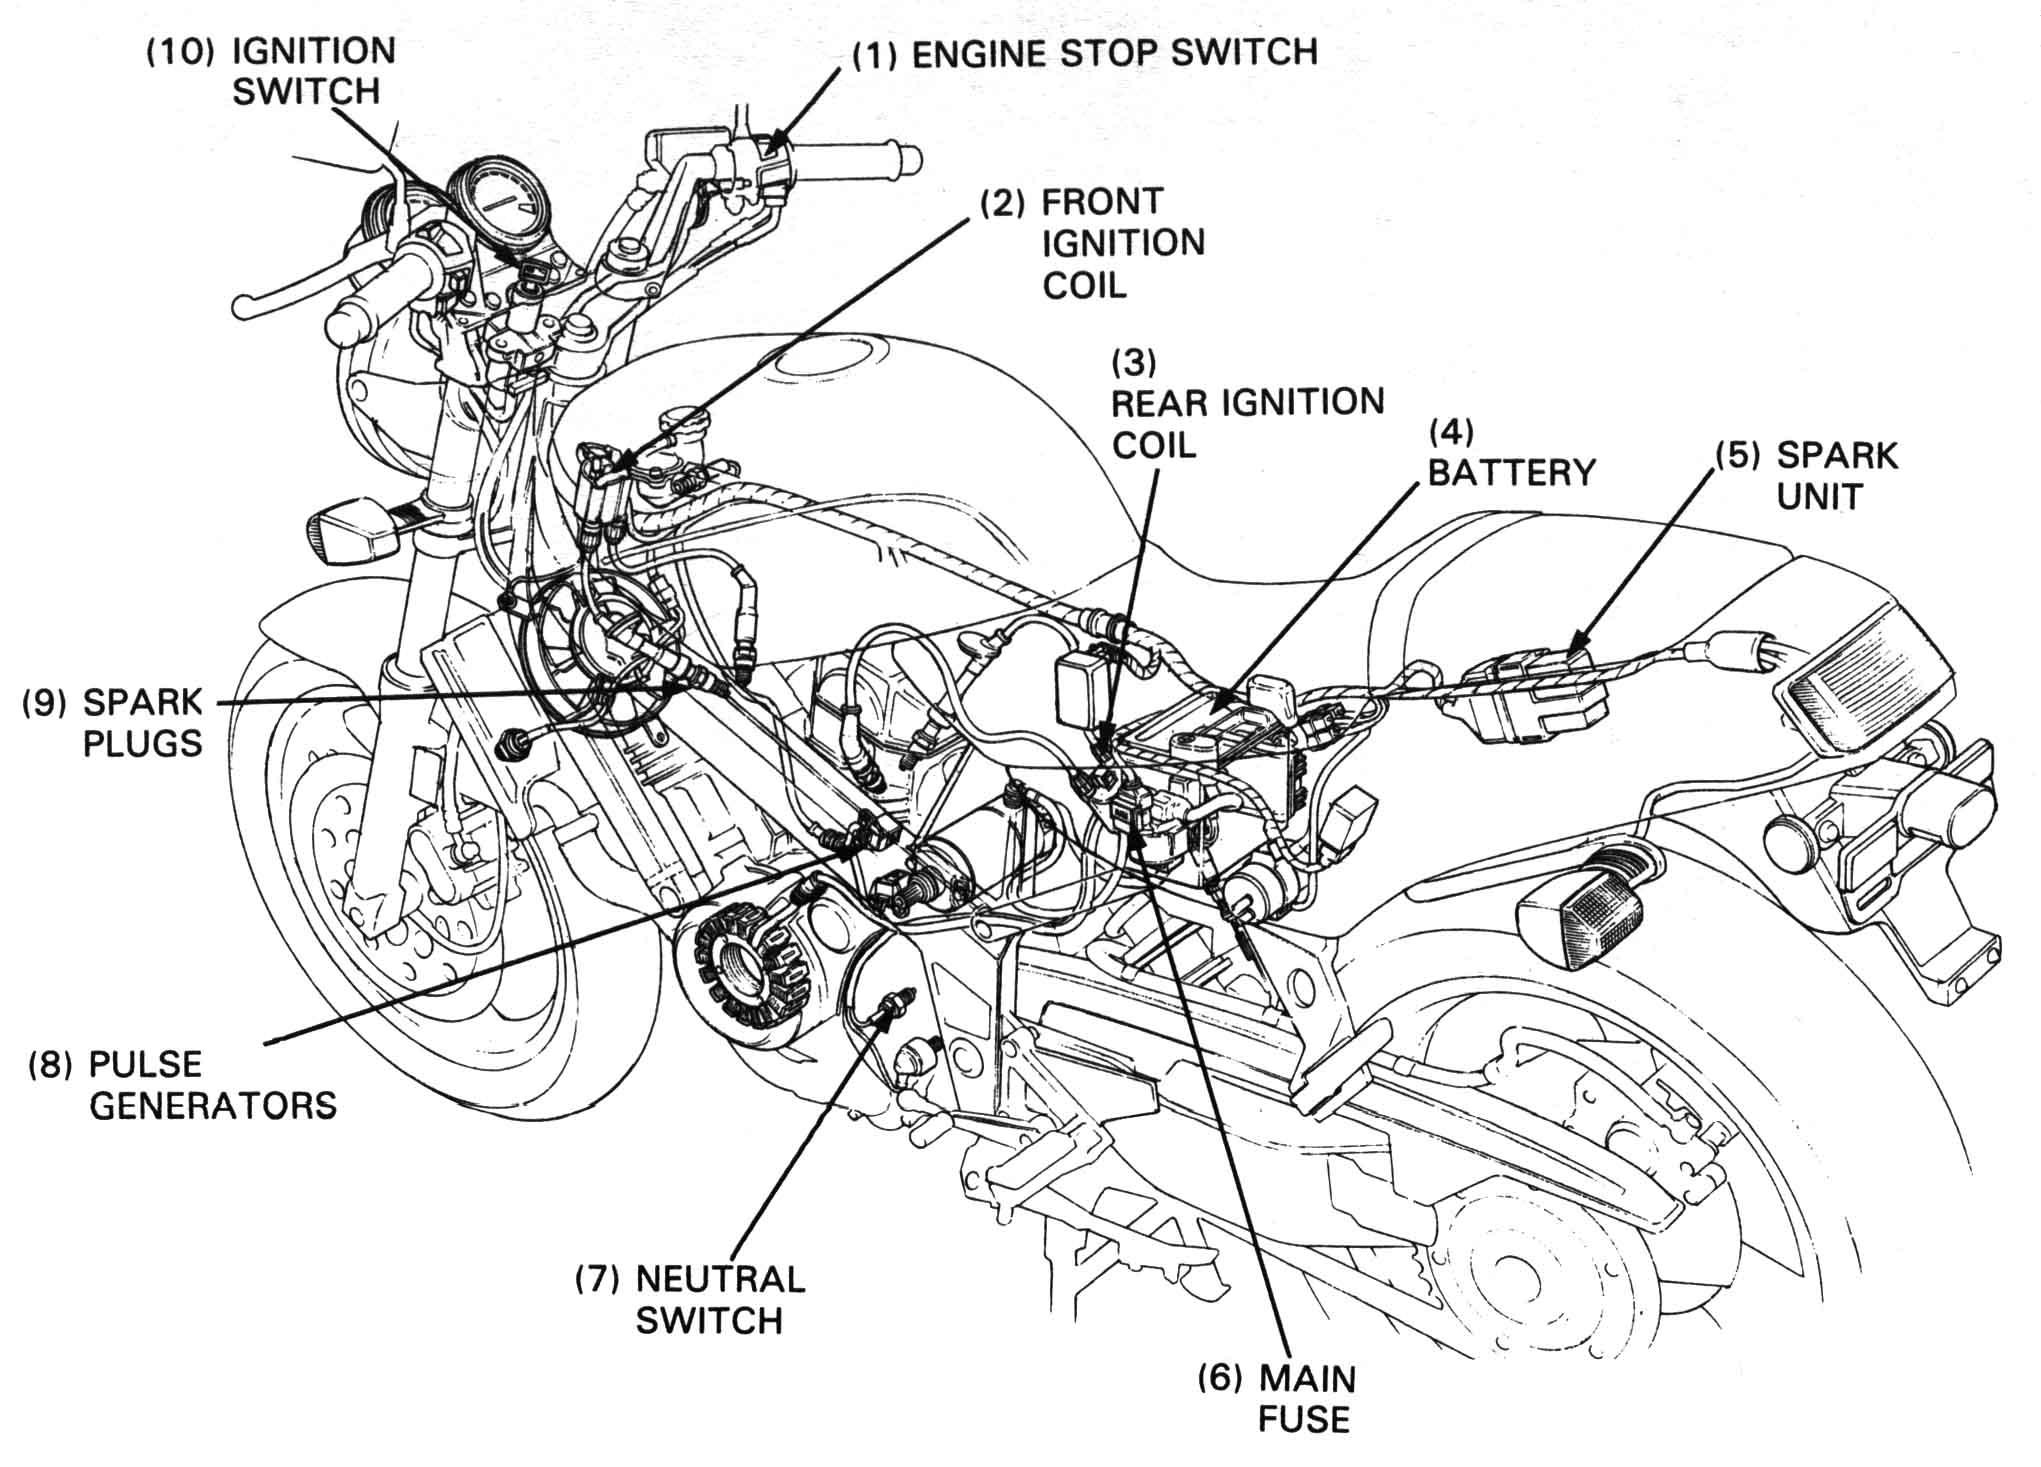 honda starter switch wiring xo 4112  honda ignition switch wiring moreover ignition system  honda ignition switch wiring moreover